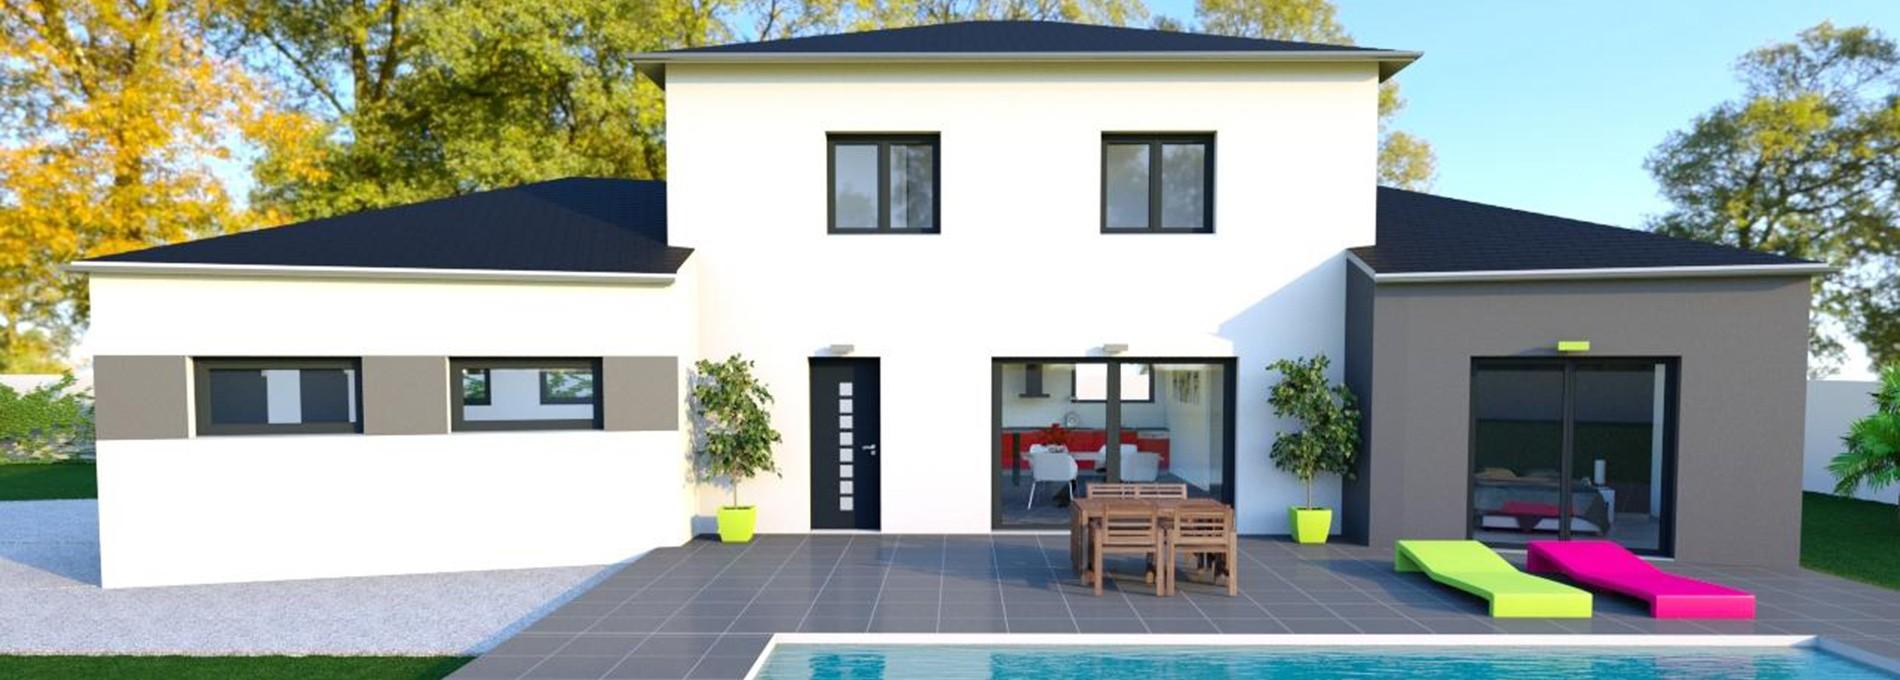 constructeur de maisons individuelles tarbes bigorre. Black Bedroom Furniture Sets. Home Design Ideas